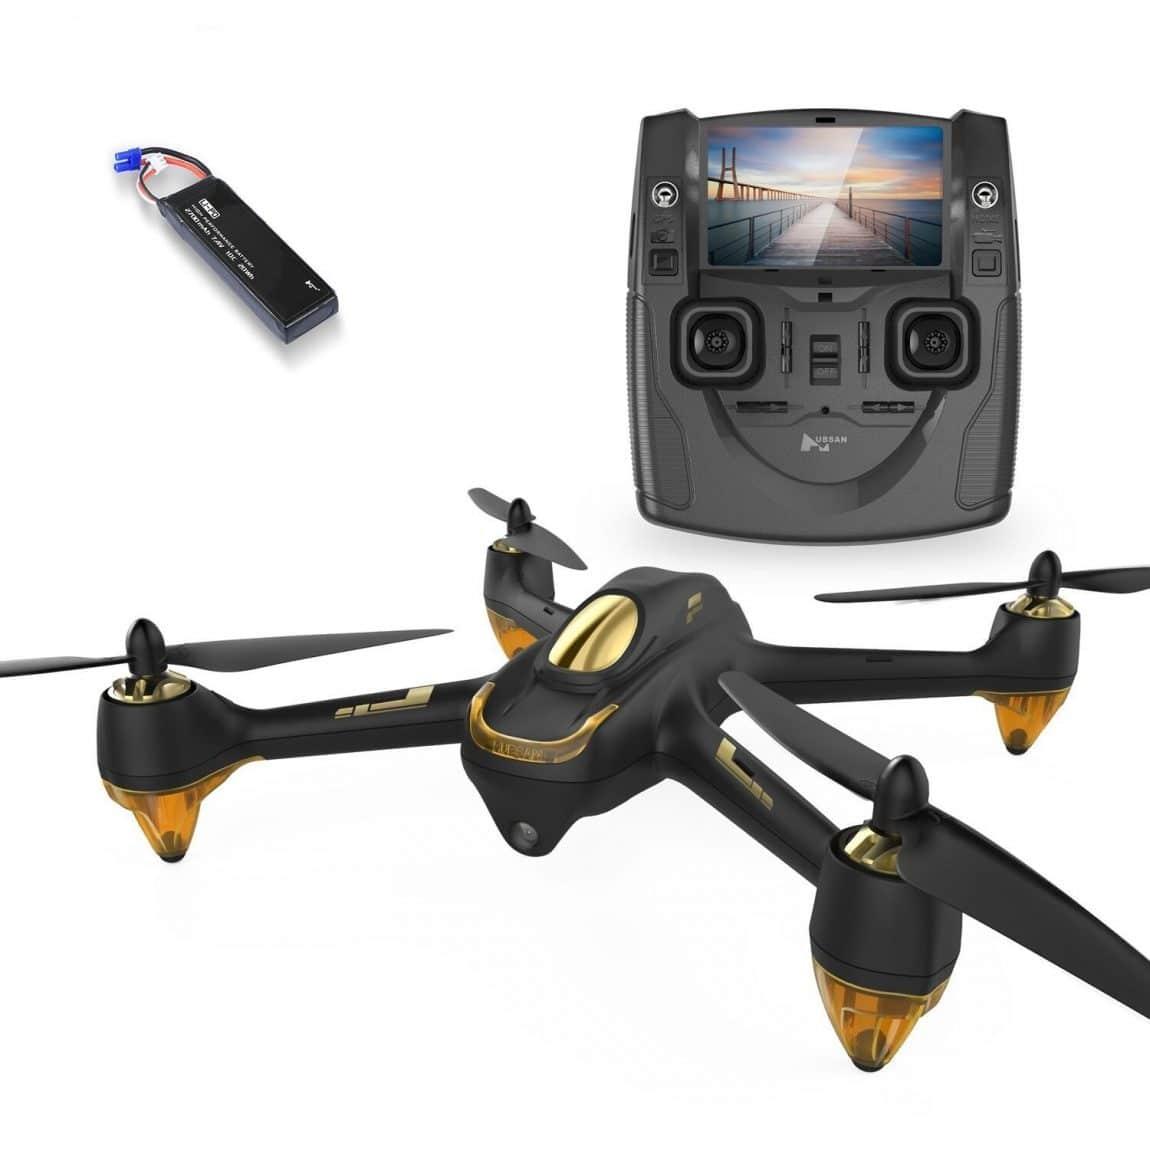 HUBSAN H501S X4 Drone